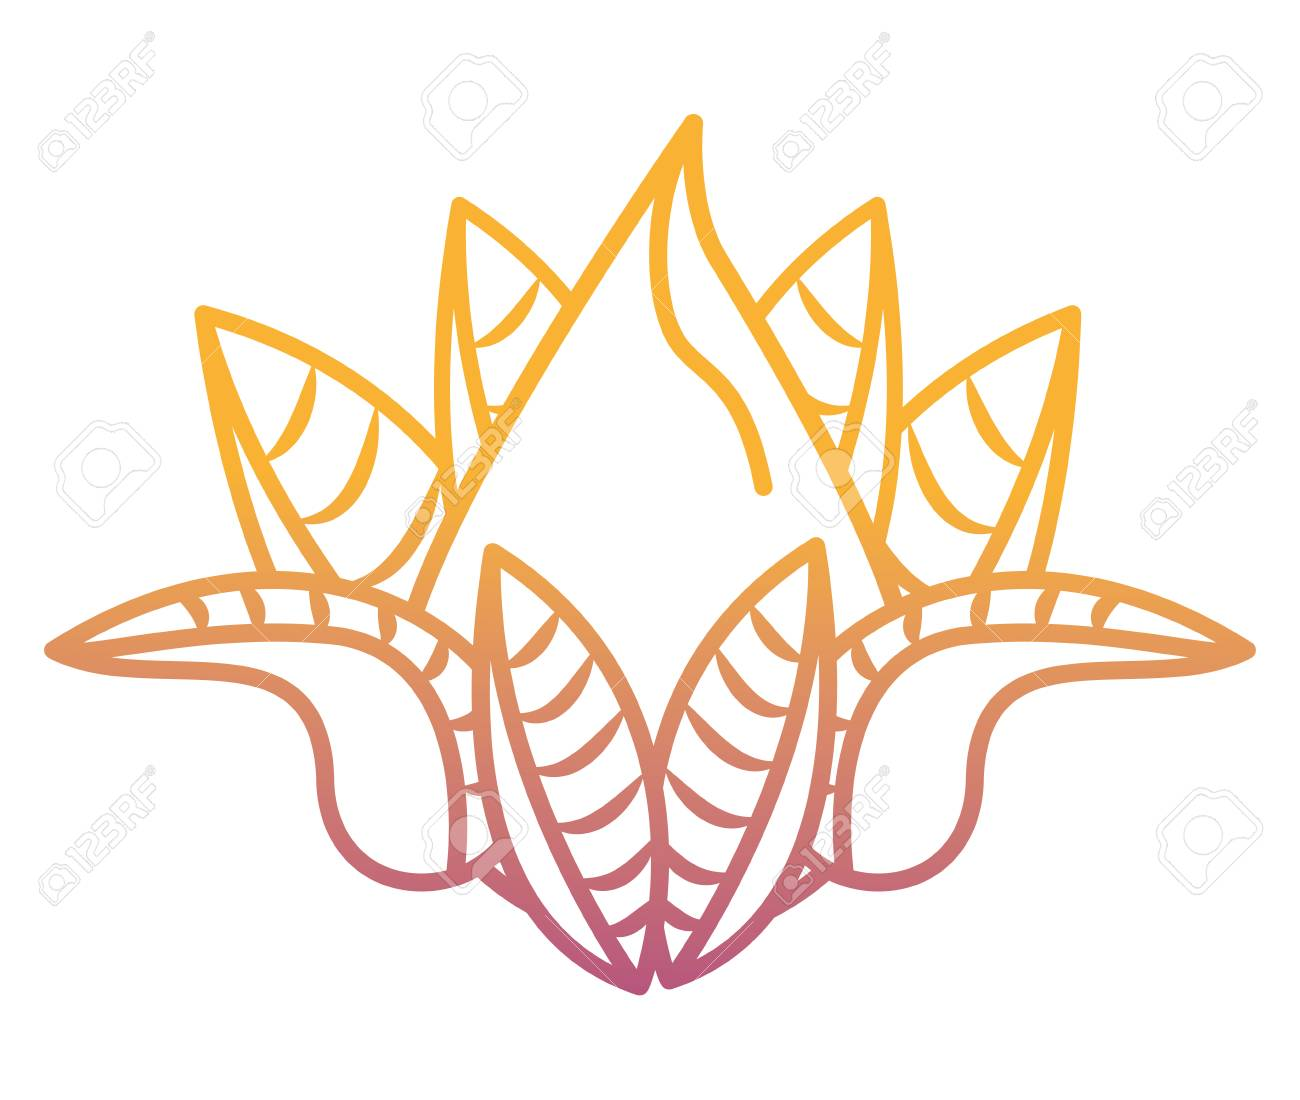 Lotus Flower Cartoon Vector Illustration Graphic Design Royalty Free